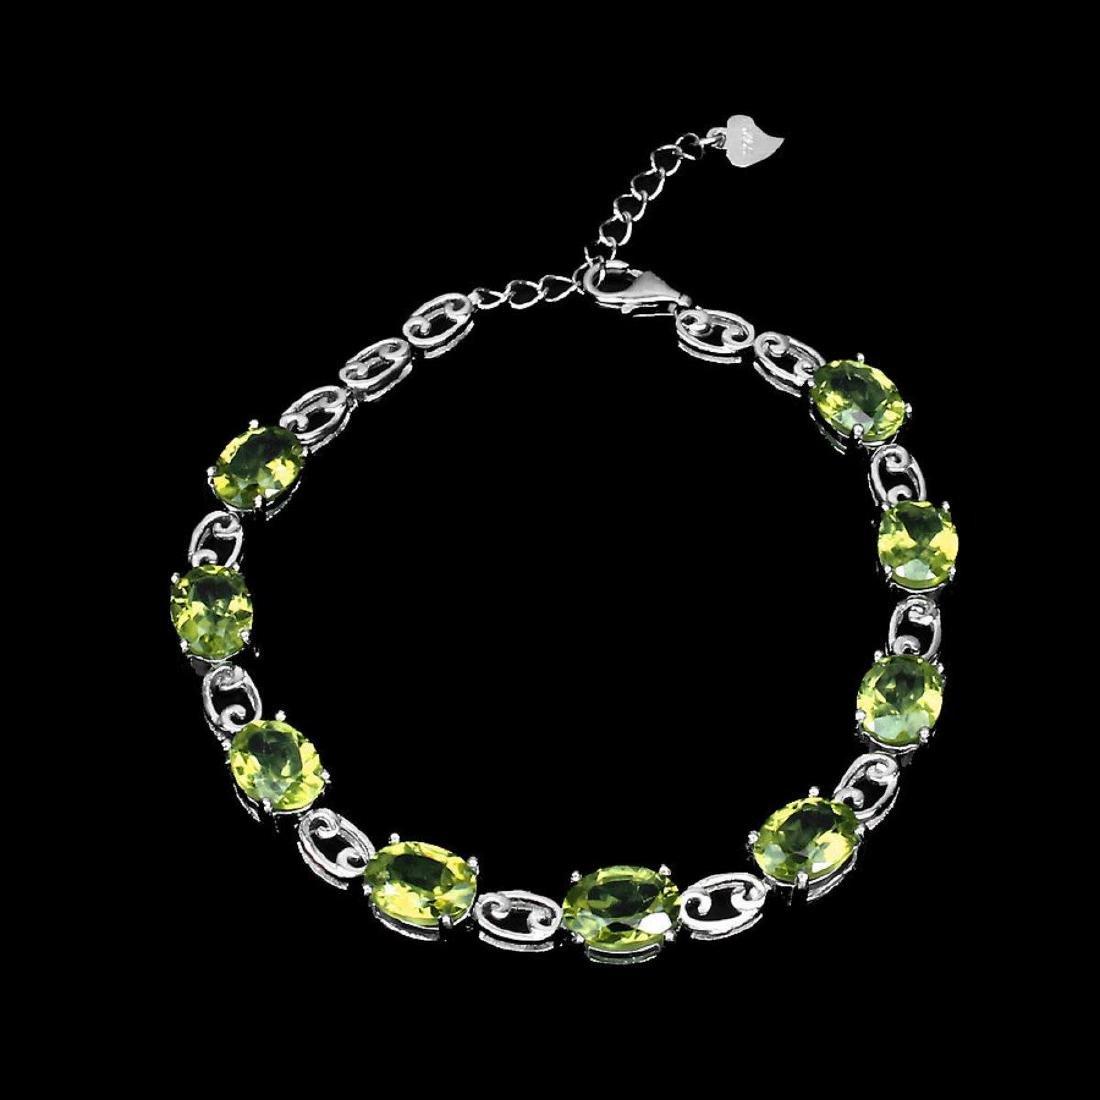 Natural  8x6mm Top Rich Green Peridot Bracelet - 2